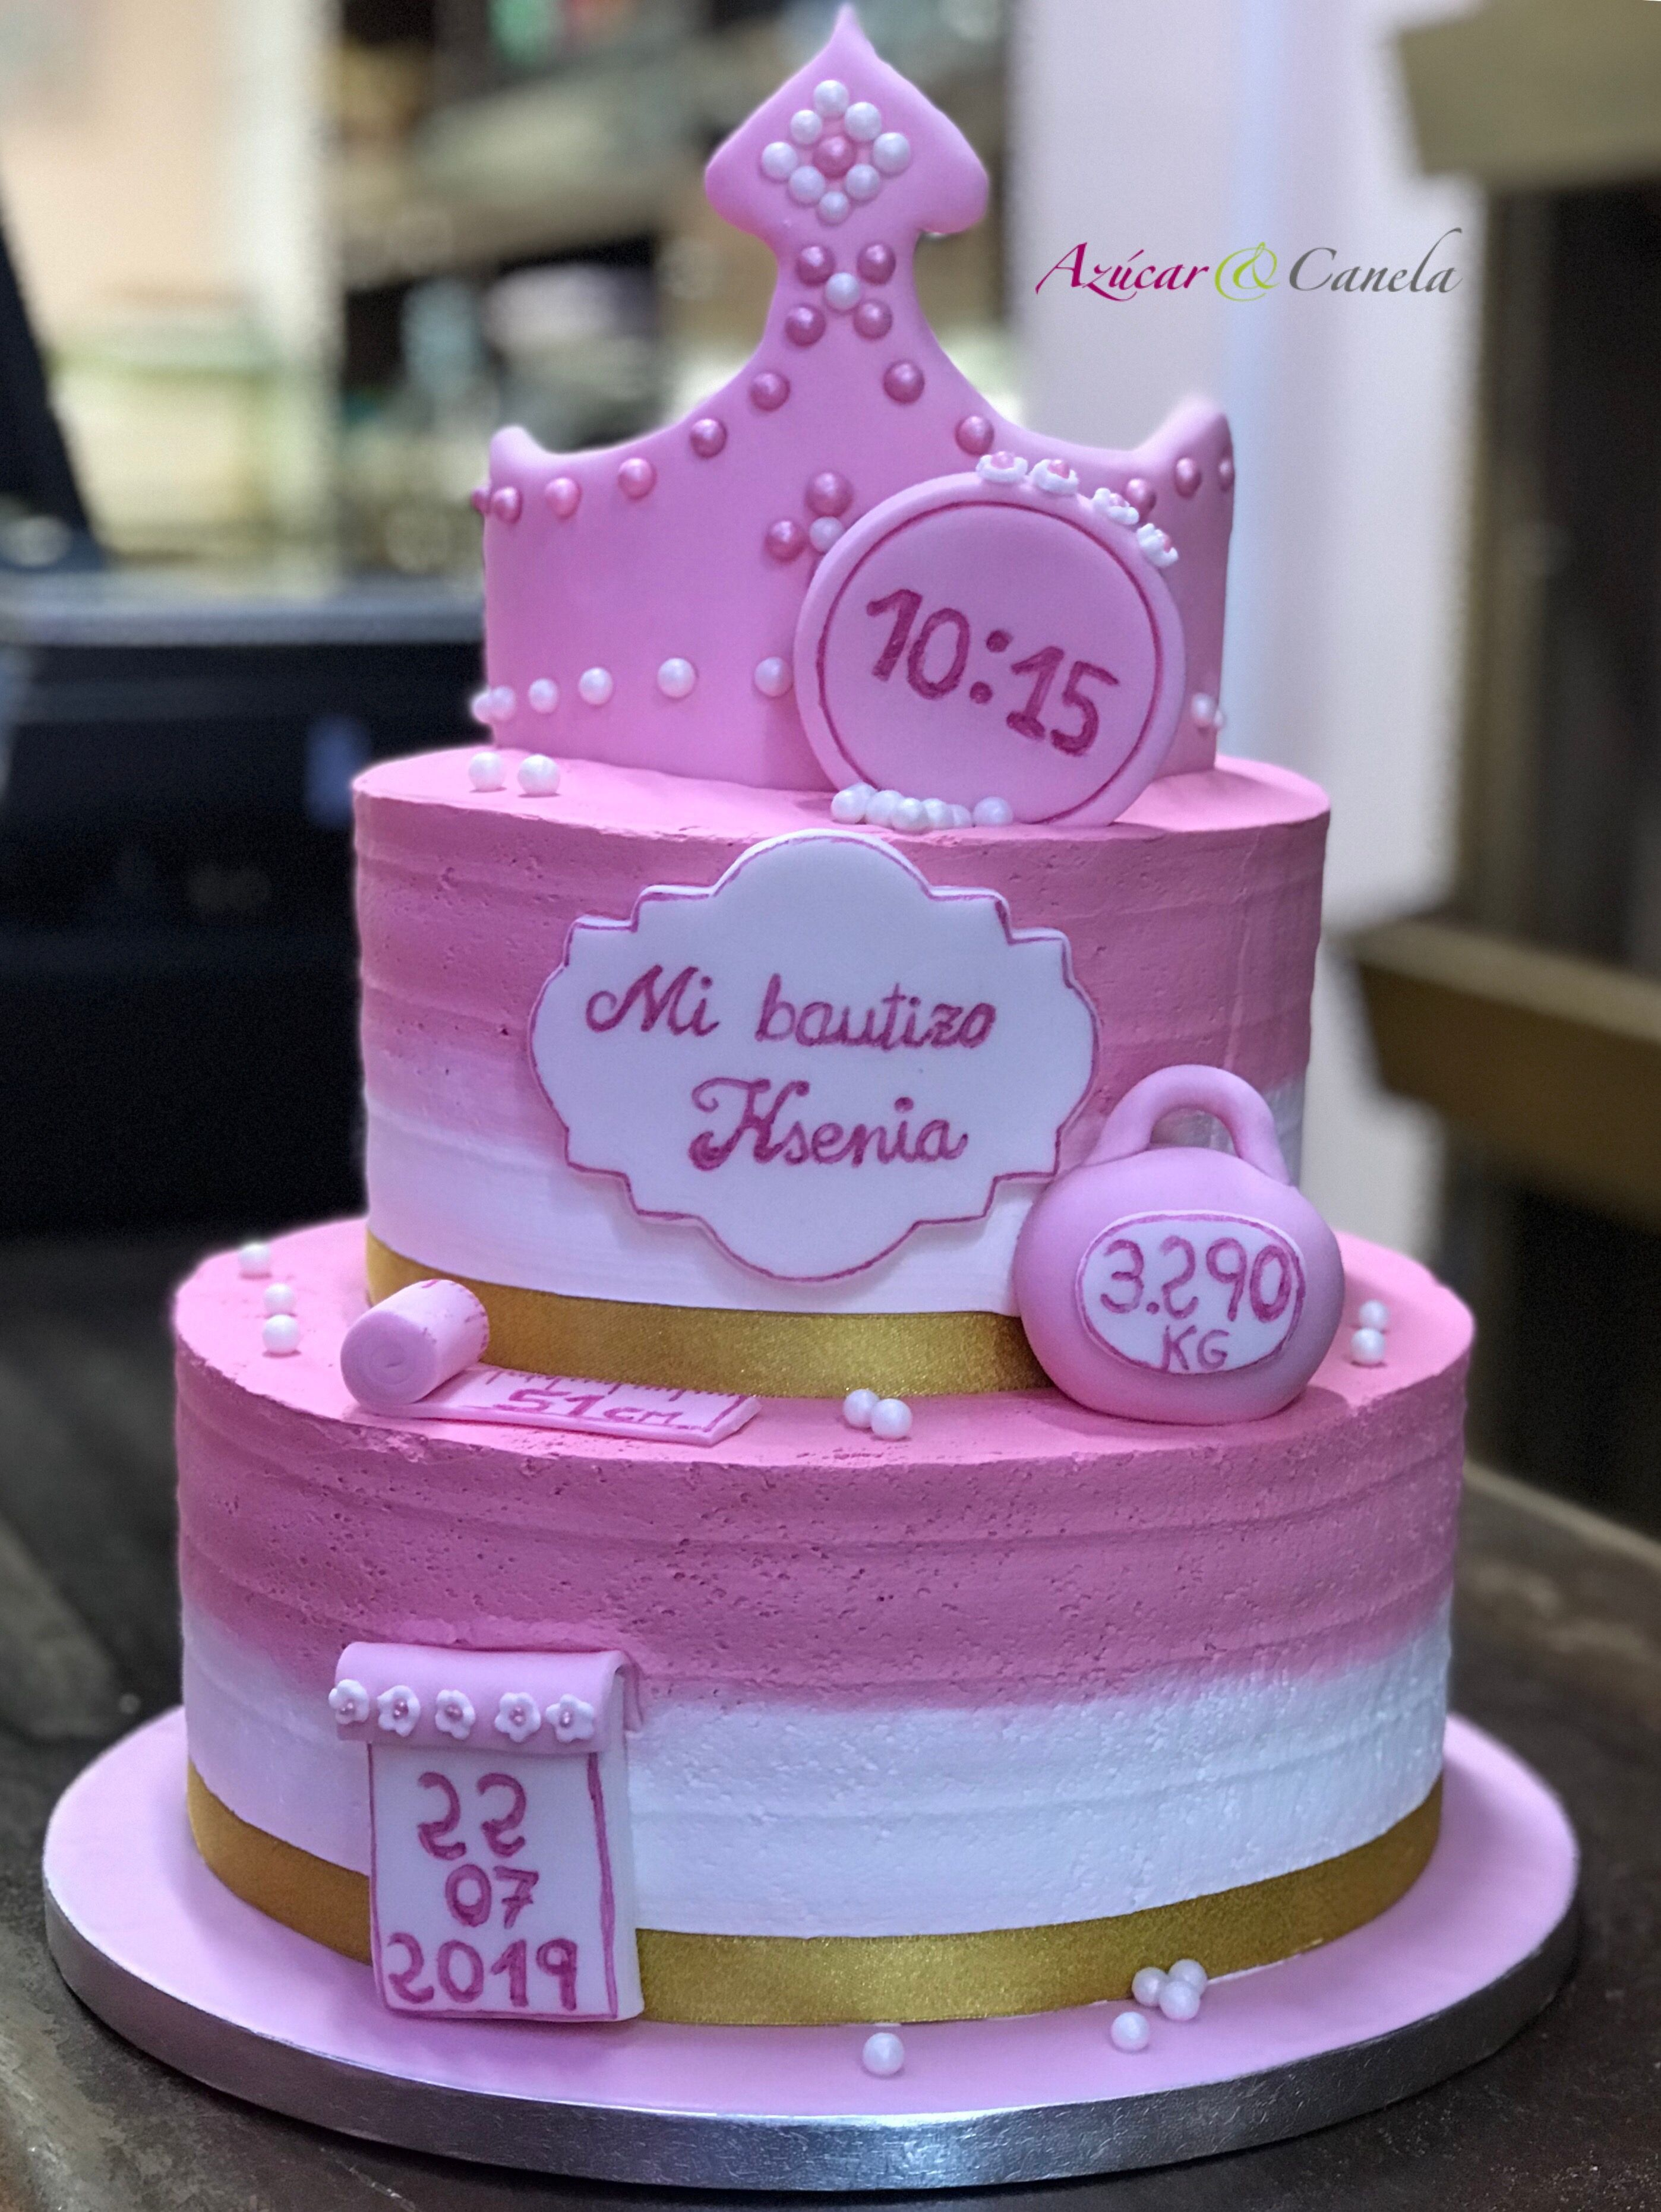 Tarta Tradicional Personalizada De Bautizo Y Baby Shower Azúcar Canela Desserts Cake 10 Things